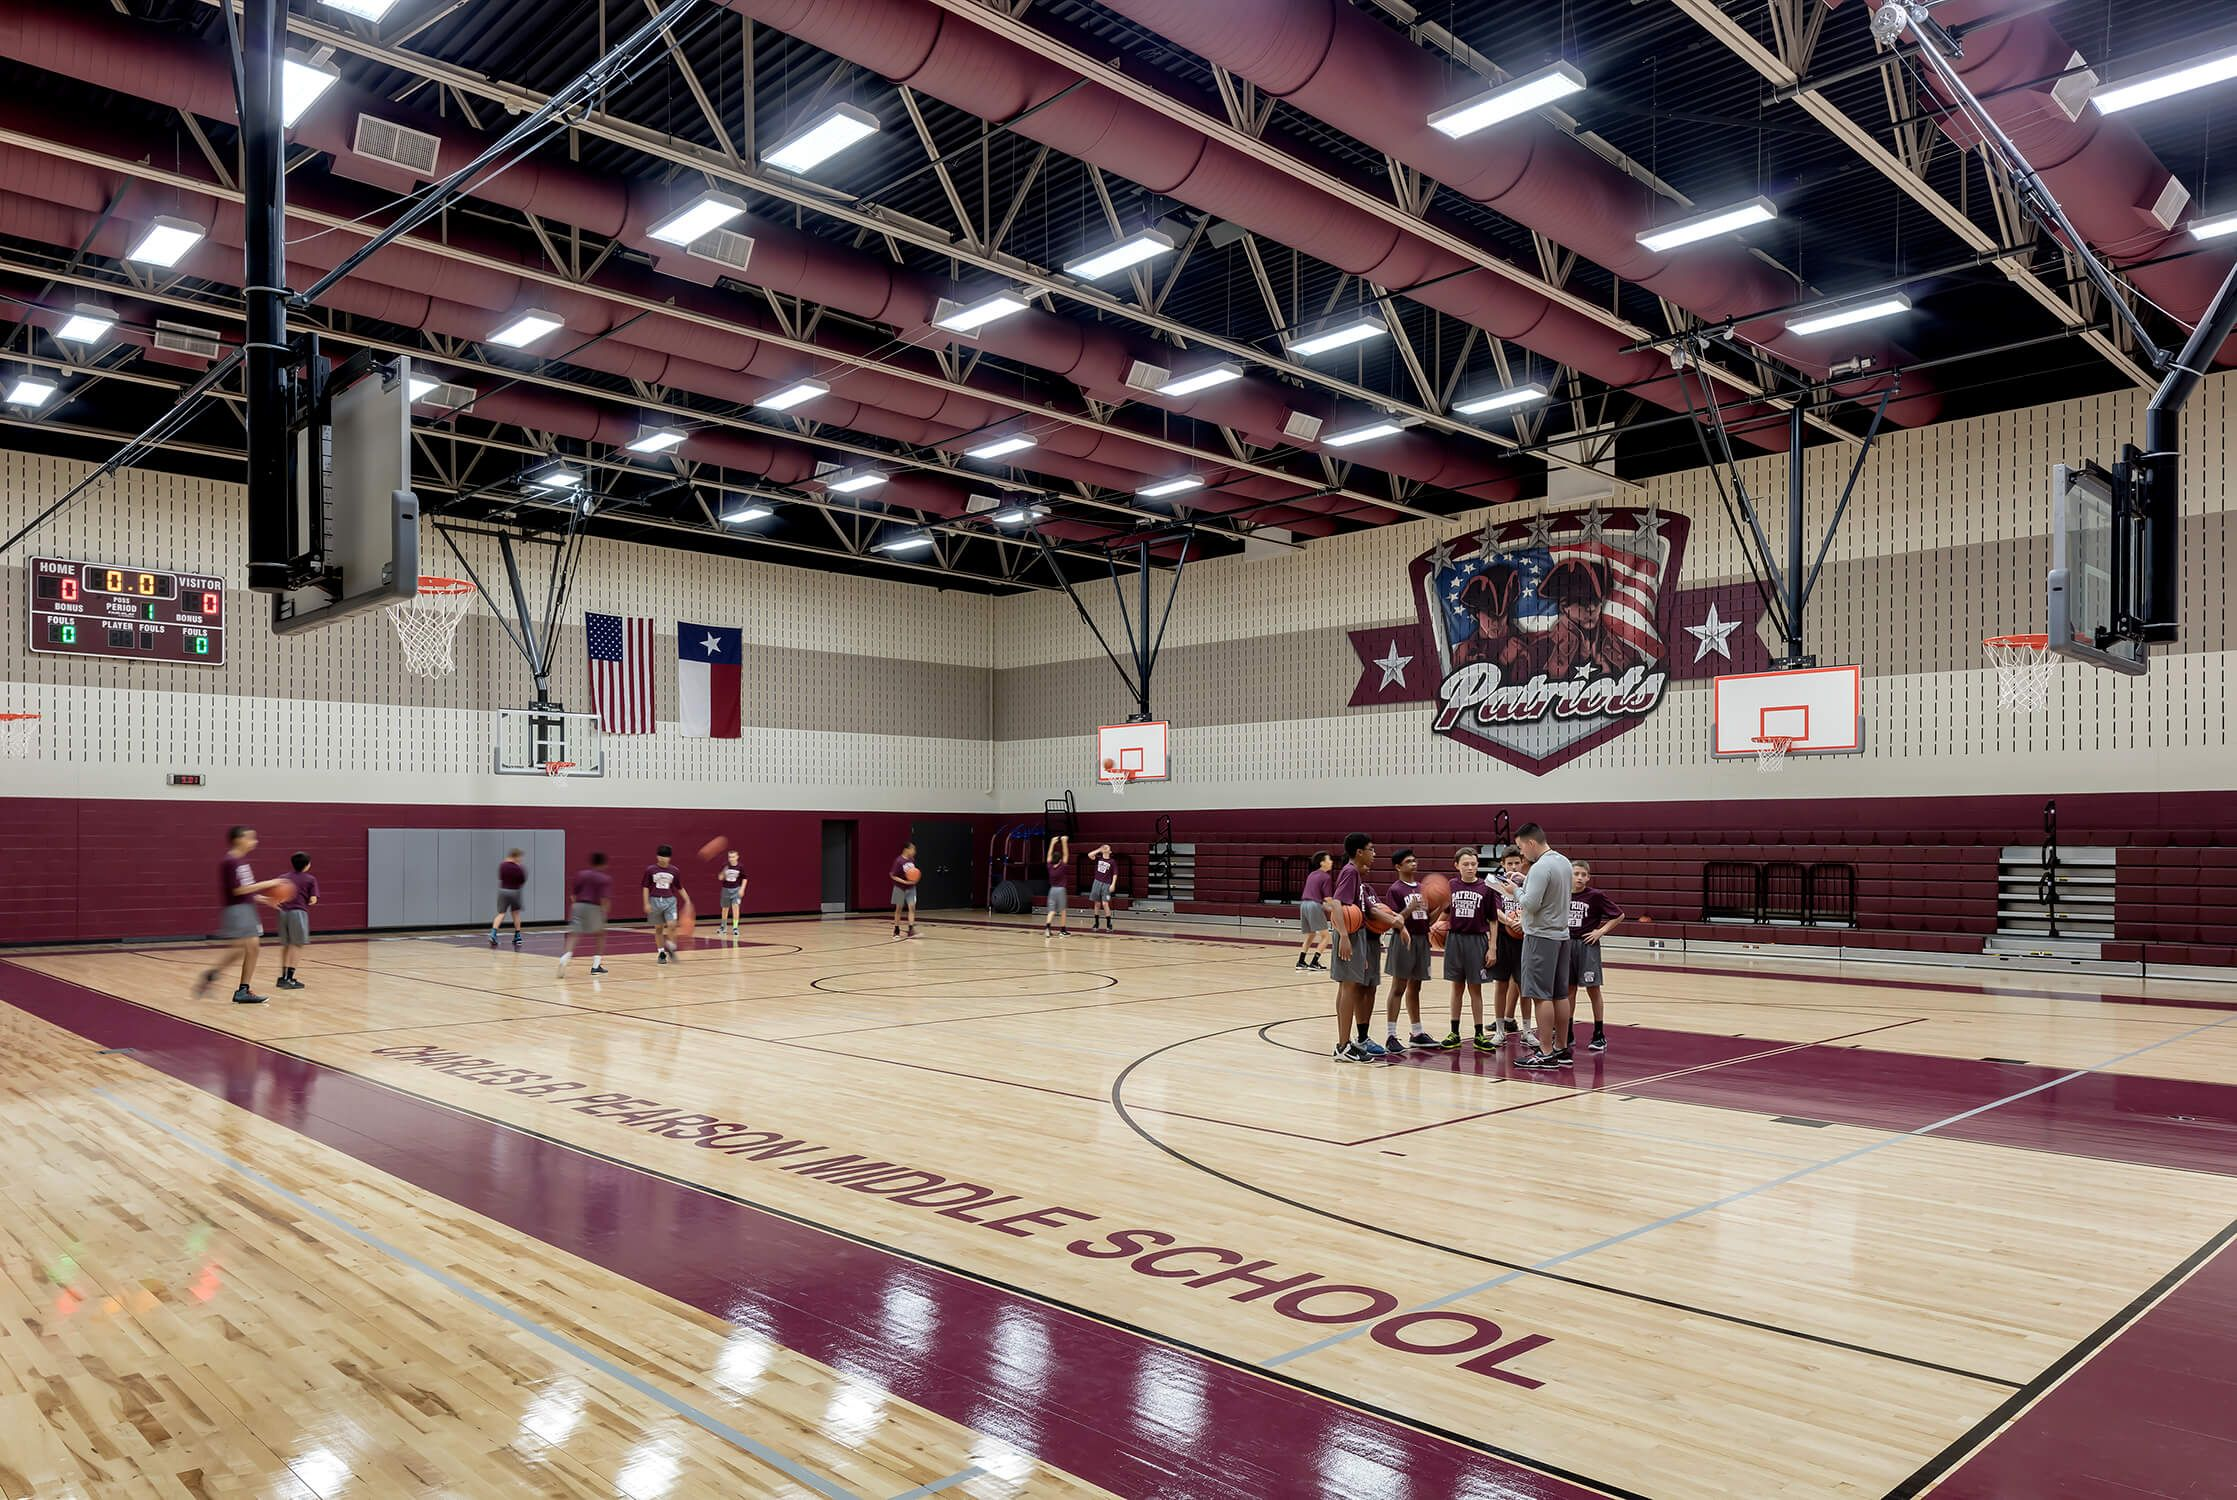 High School Basketball Court Google Search High School Basketball Basketball Bracket Basketball Court